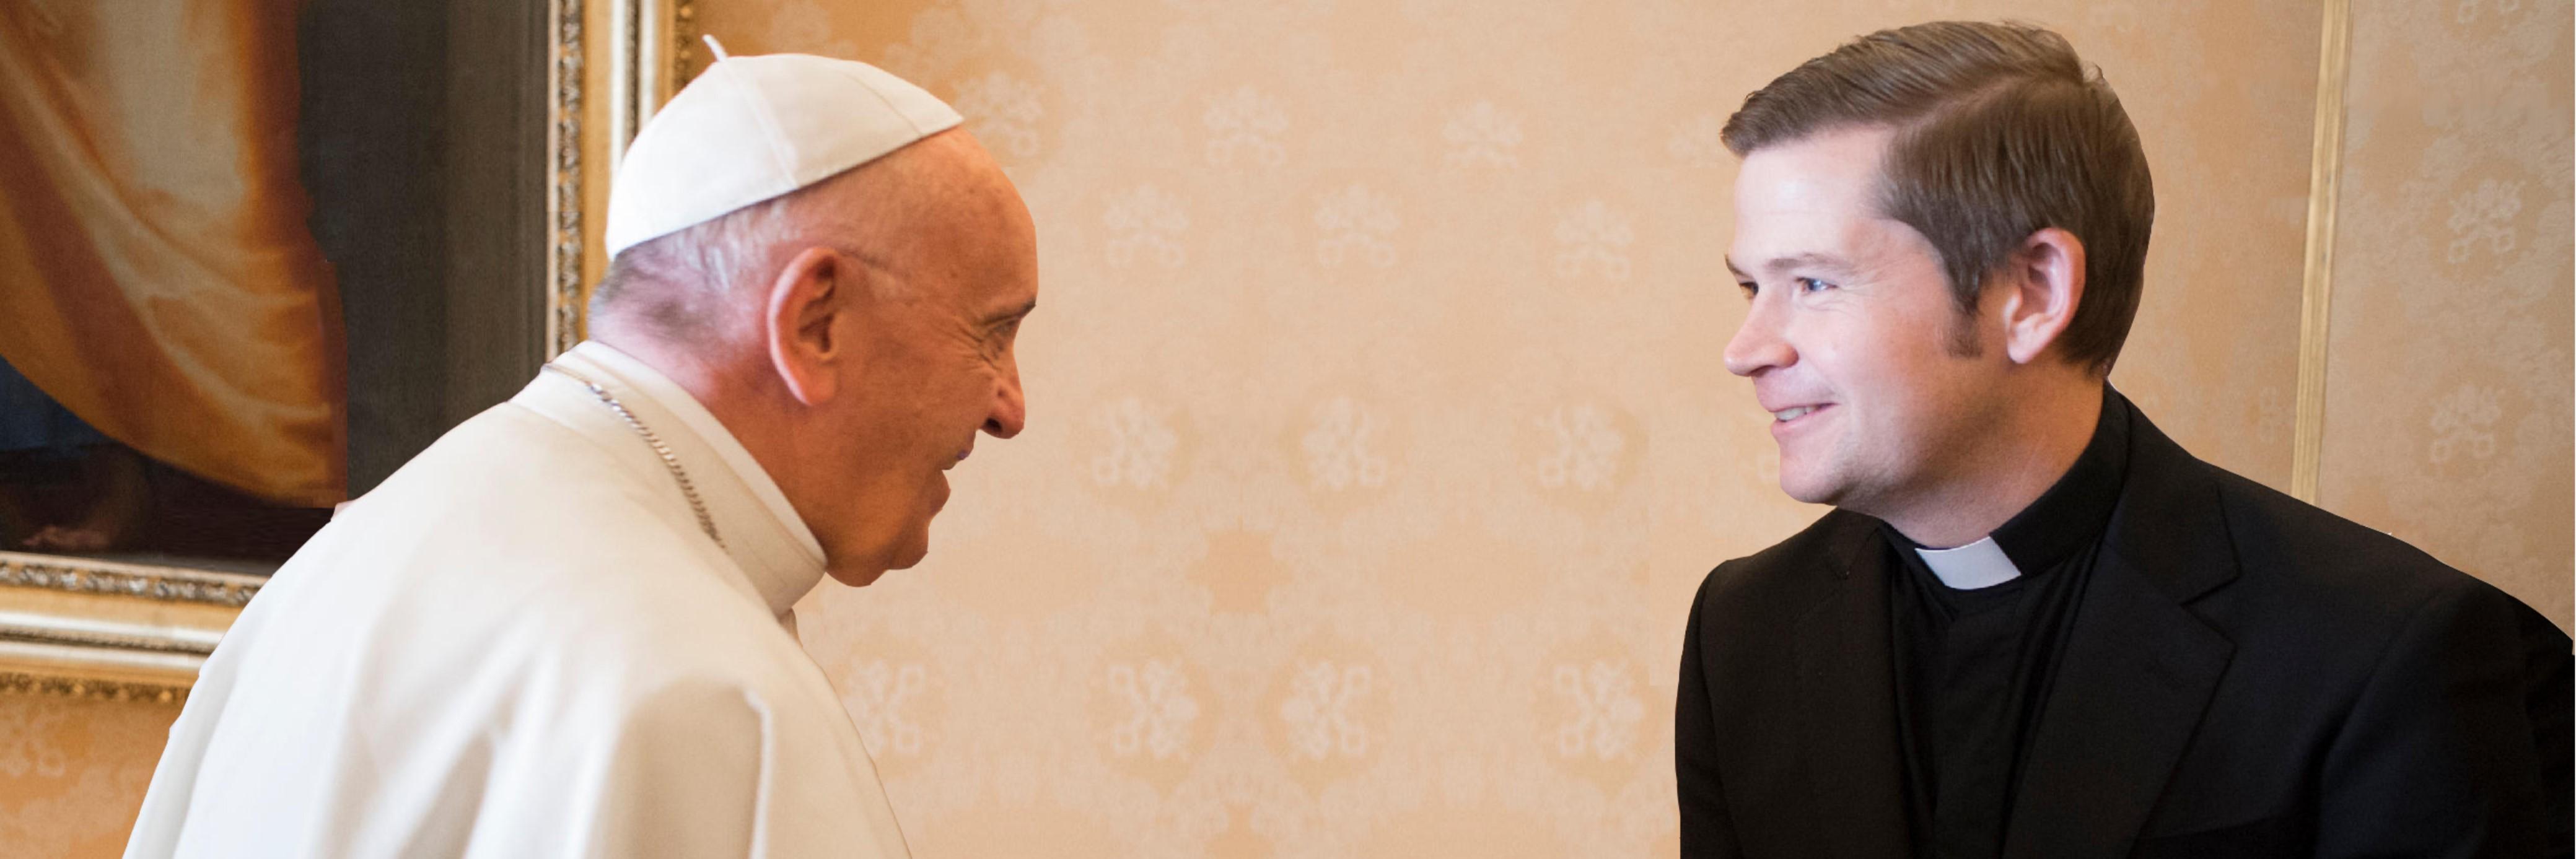 Rev. Ronald meets Pope Francis